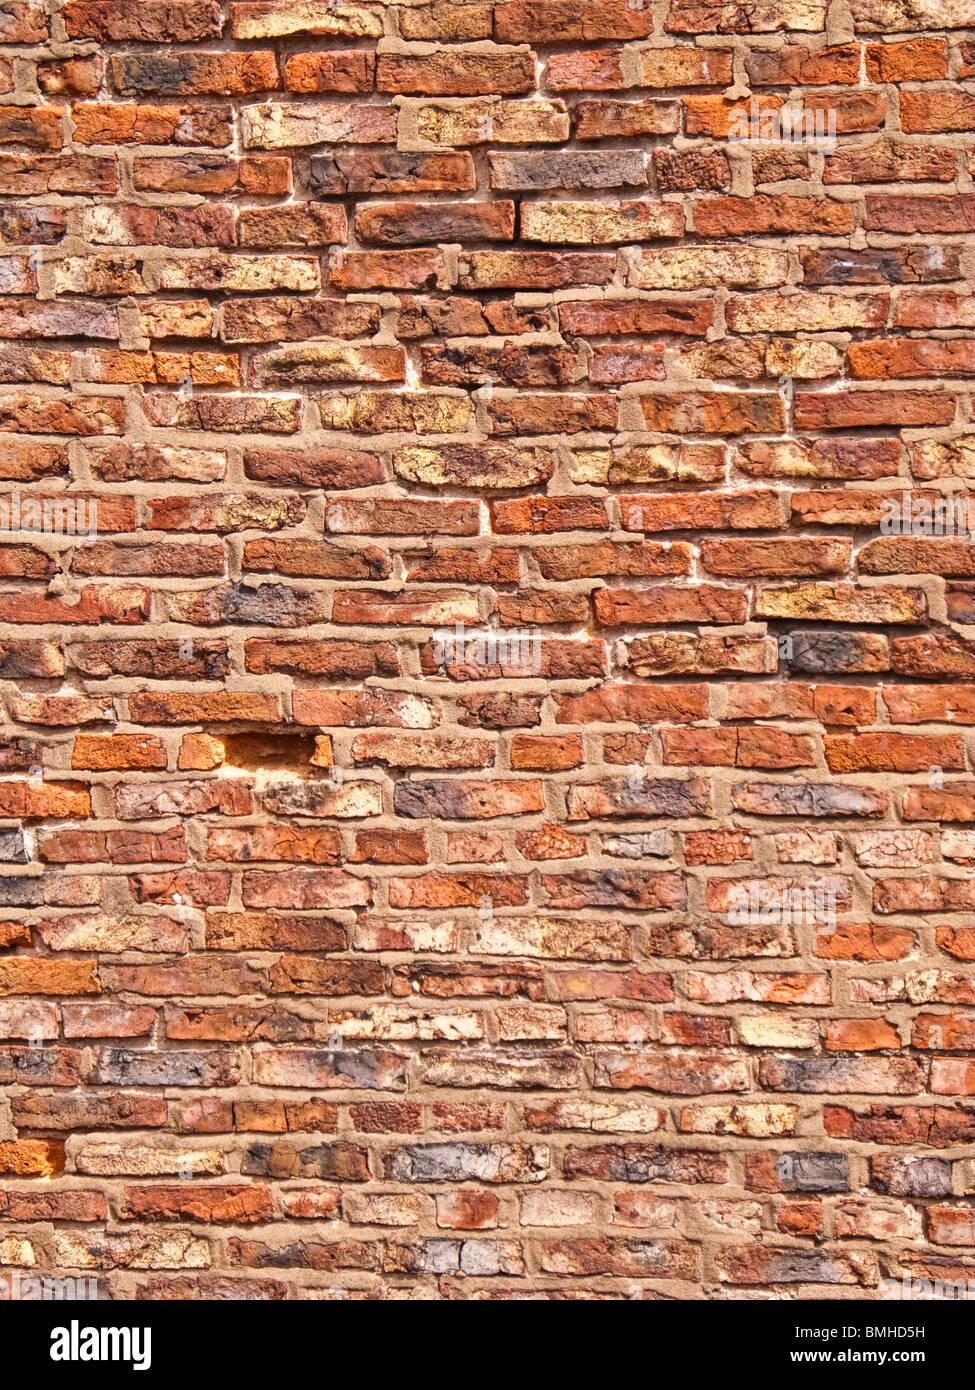 Brick wall - texture - Stock Image